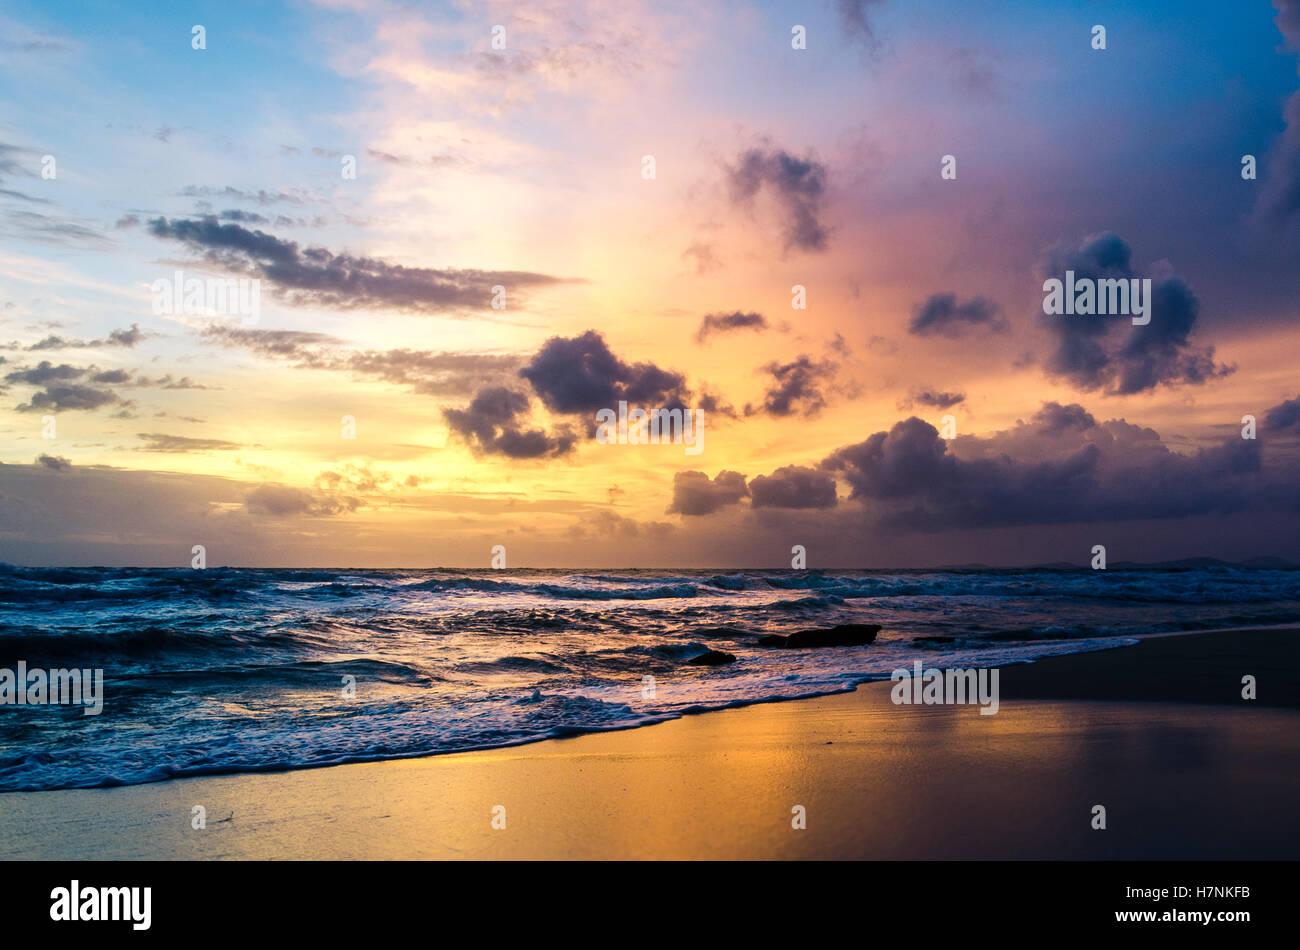 Sunset on the beach, Phu Quoc Island, Vietnam - Stock Image